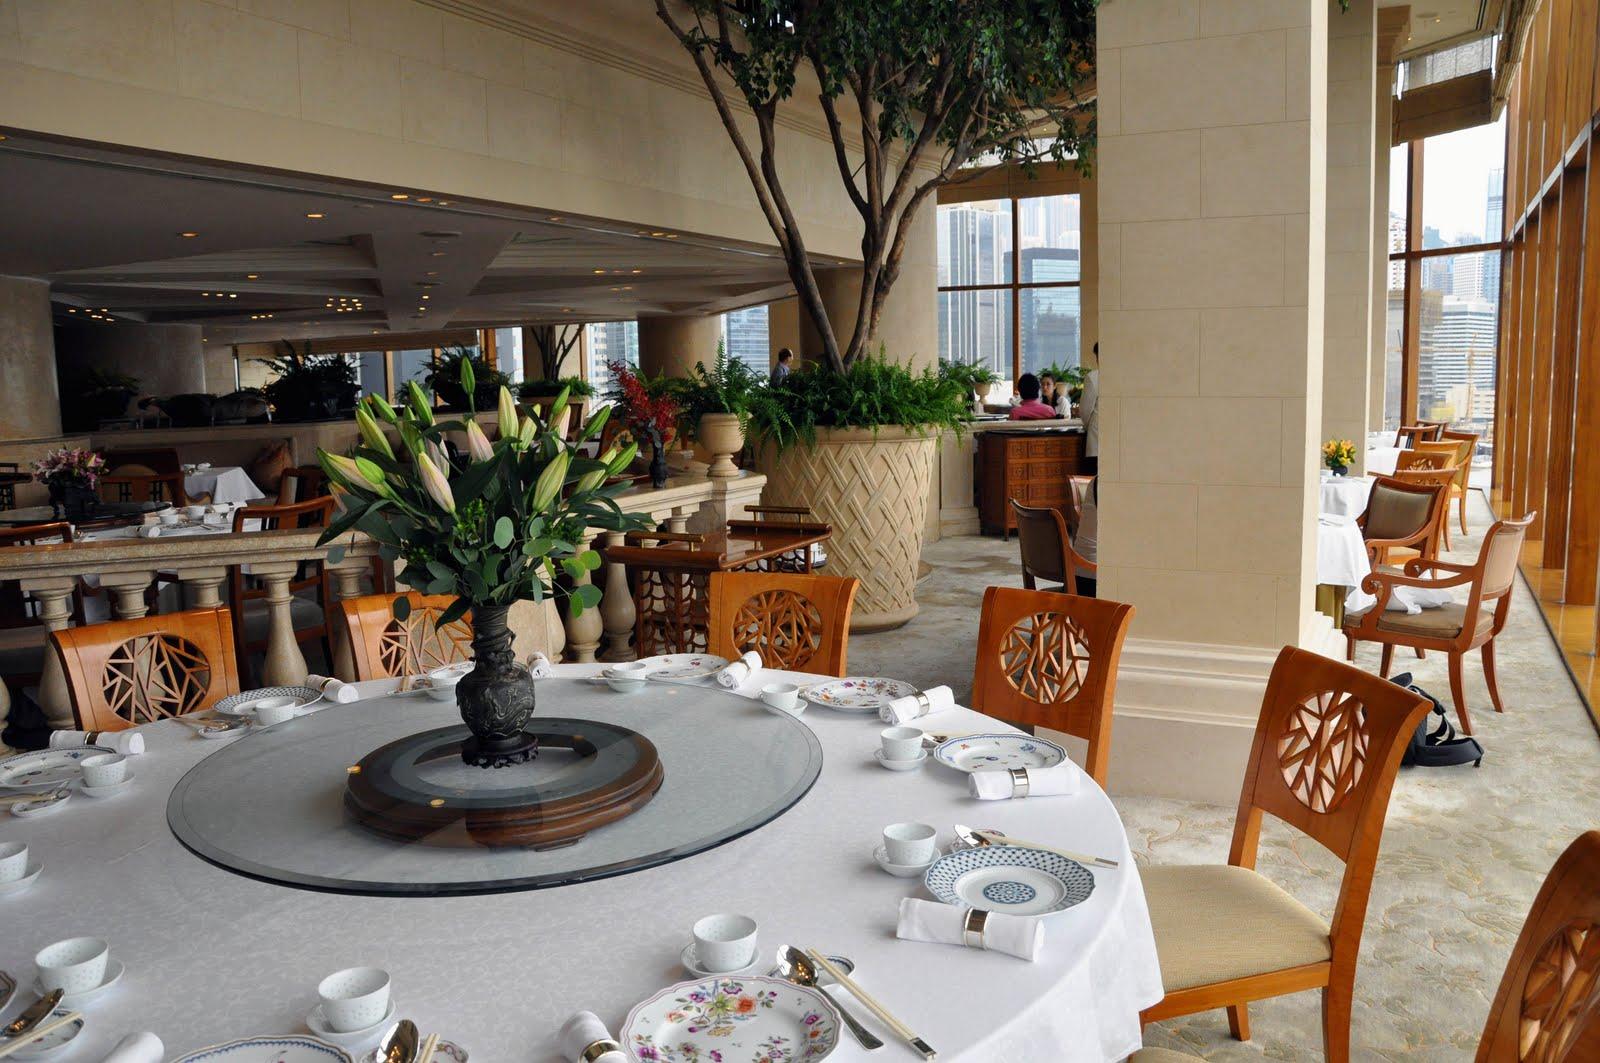 hong kong cantonese food restaurants 10best restaurant reviews. Black Bedroom Furniture Sets. Home Design Ideas